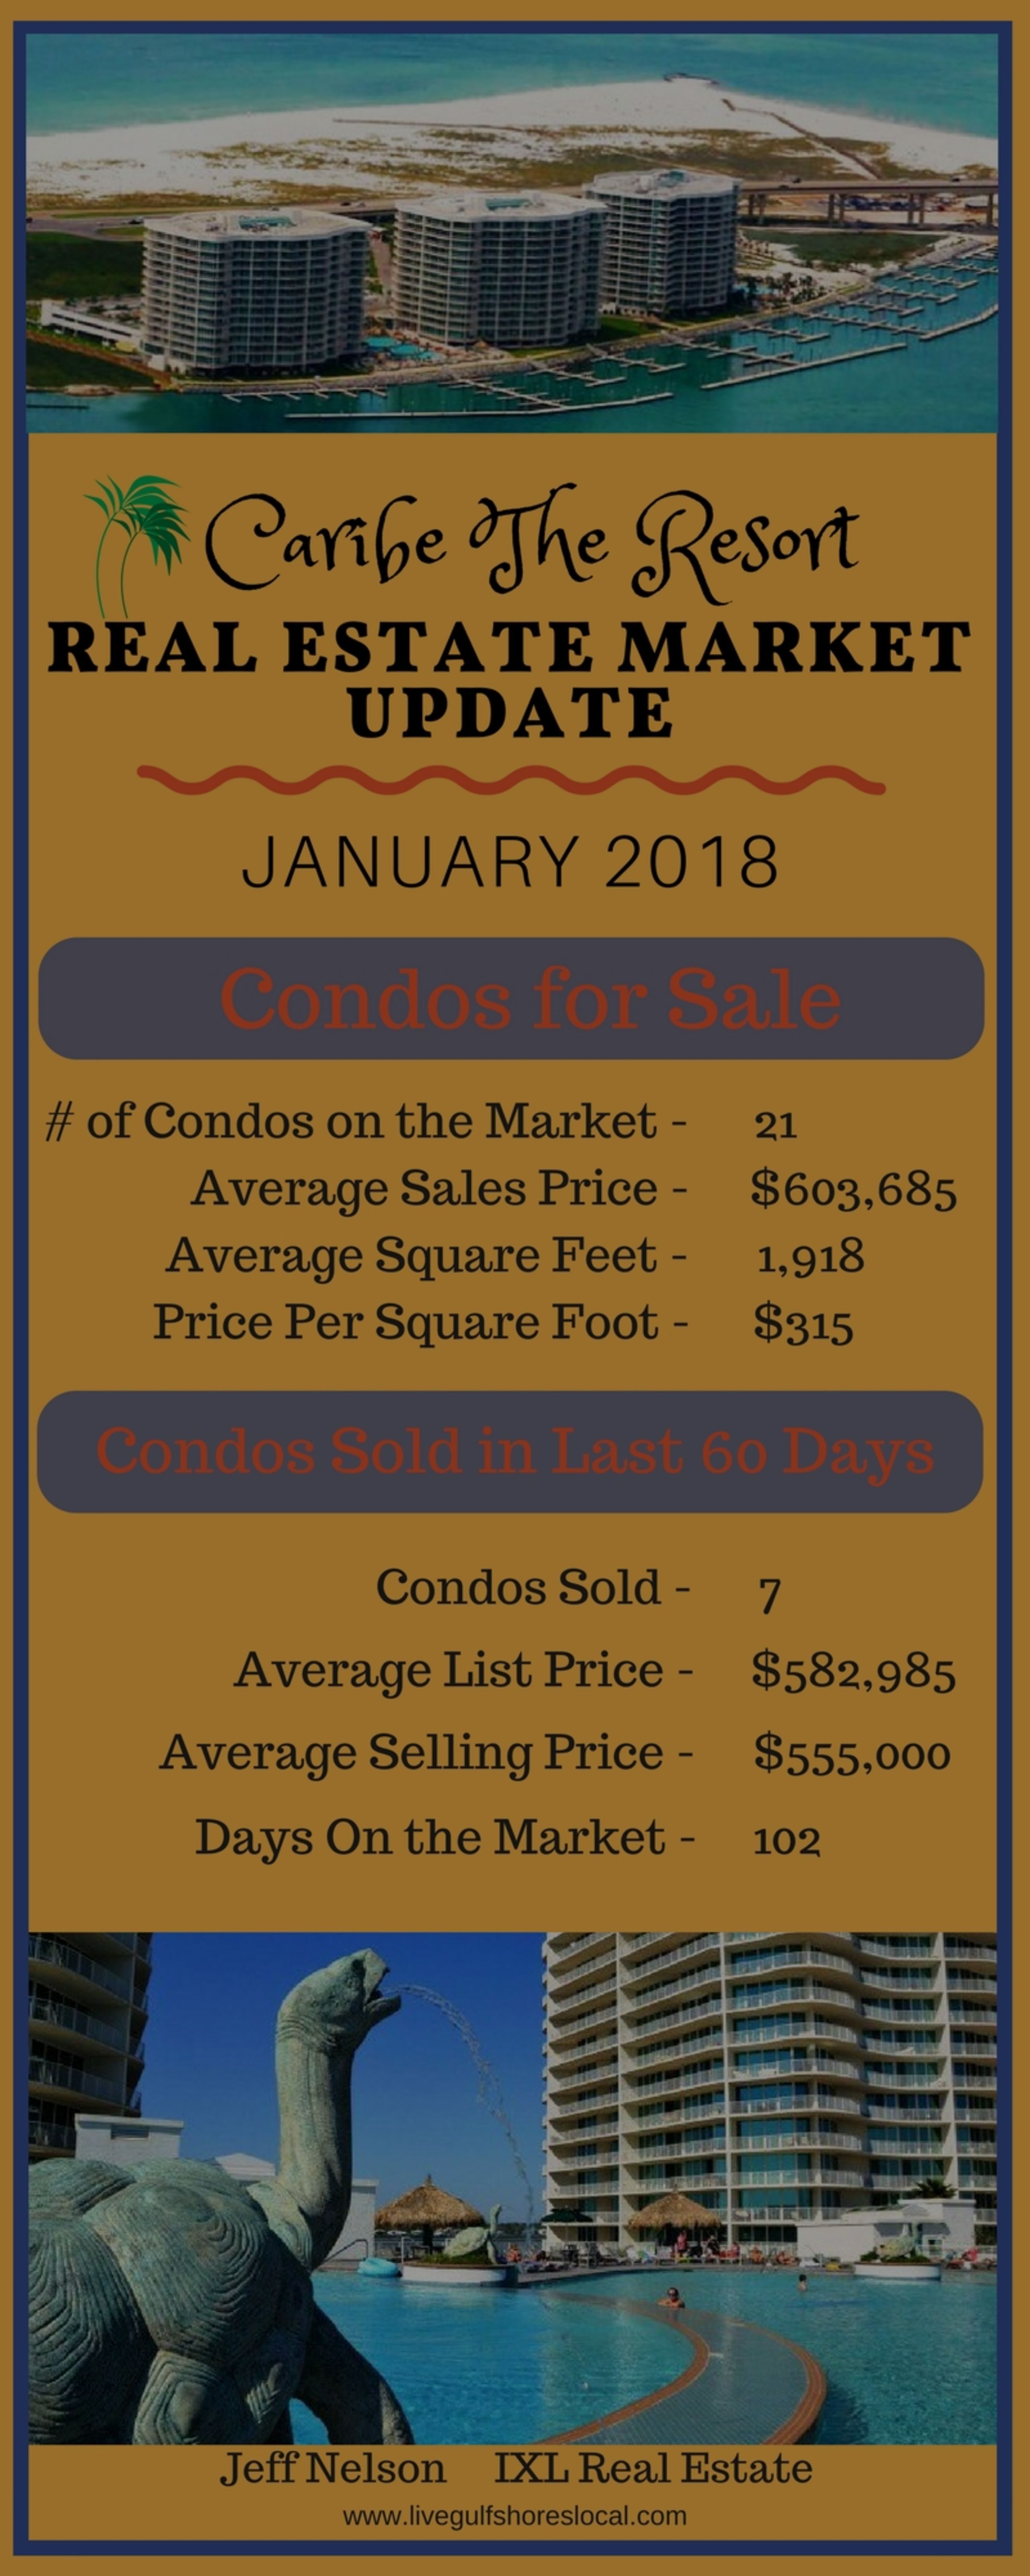 Caribe Real Estate Market Report – January 2018